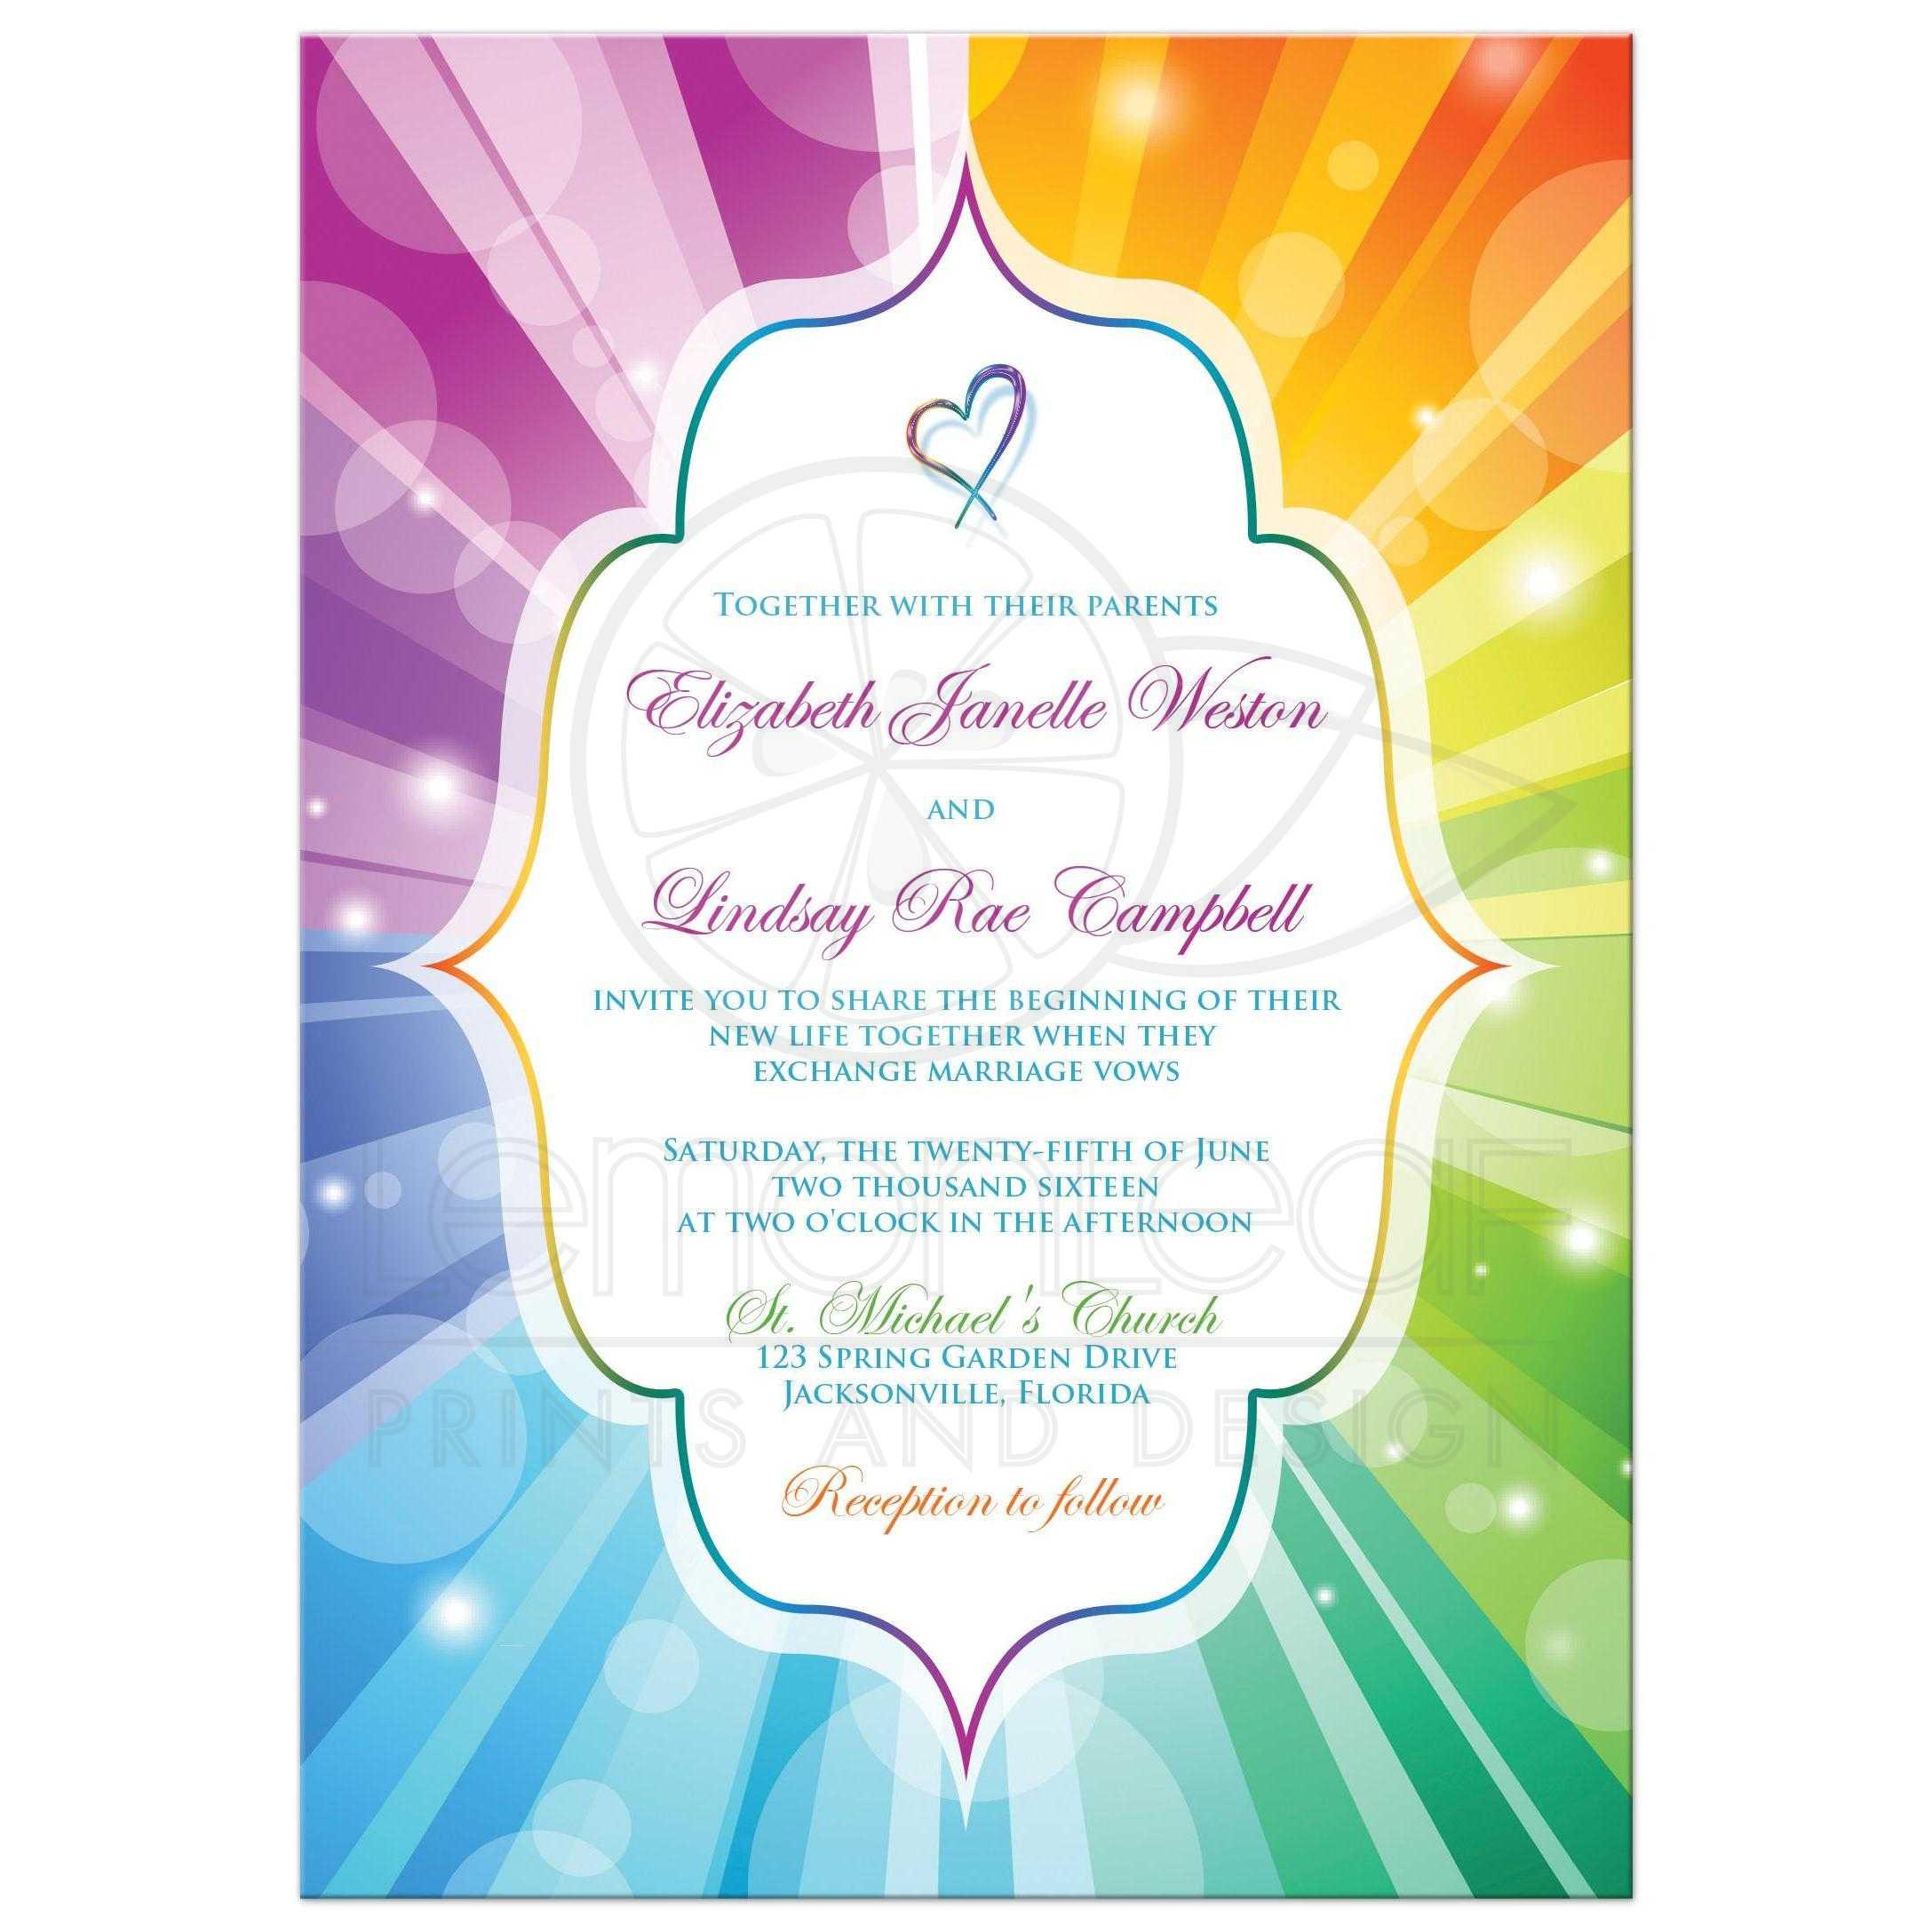 Superior Best Rainbow Striped Sunburst Wedding Invitations With A Heart ...